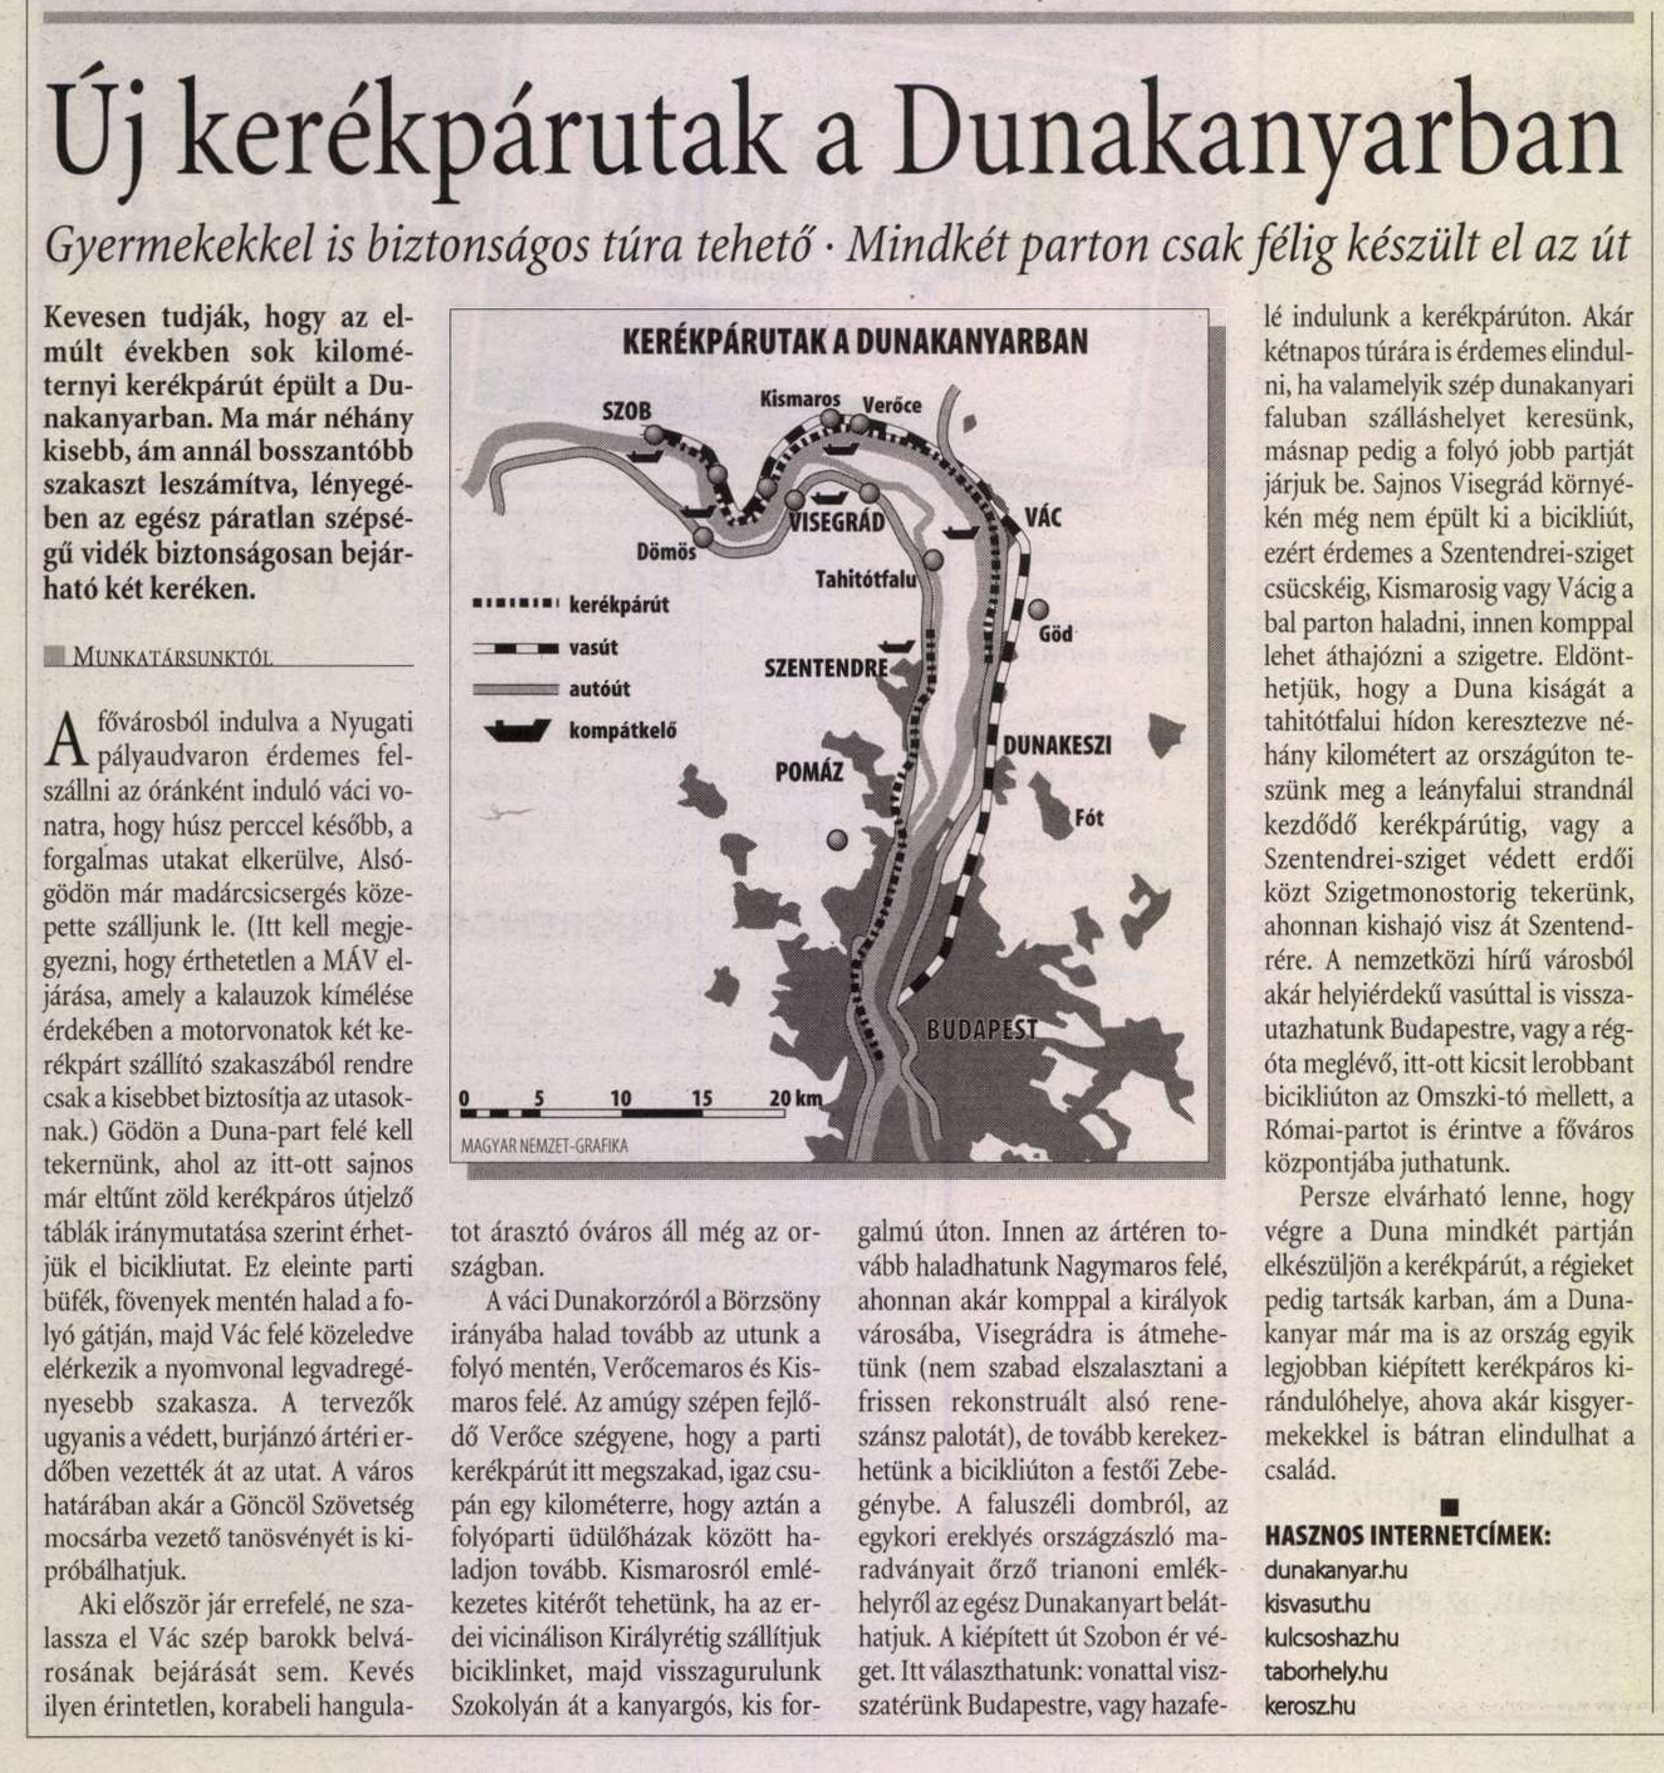 magyarnemzet_2005_08_pages434-434-1_1.jpg